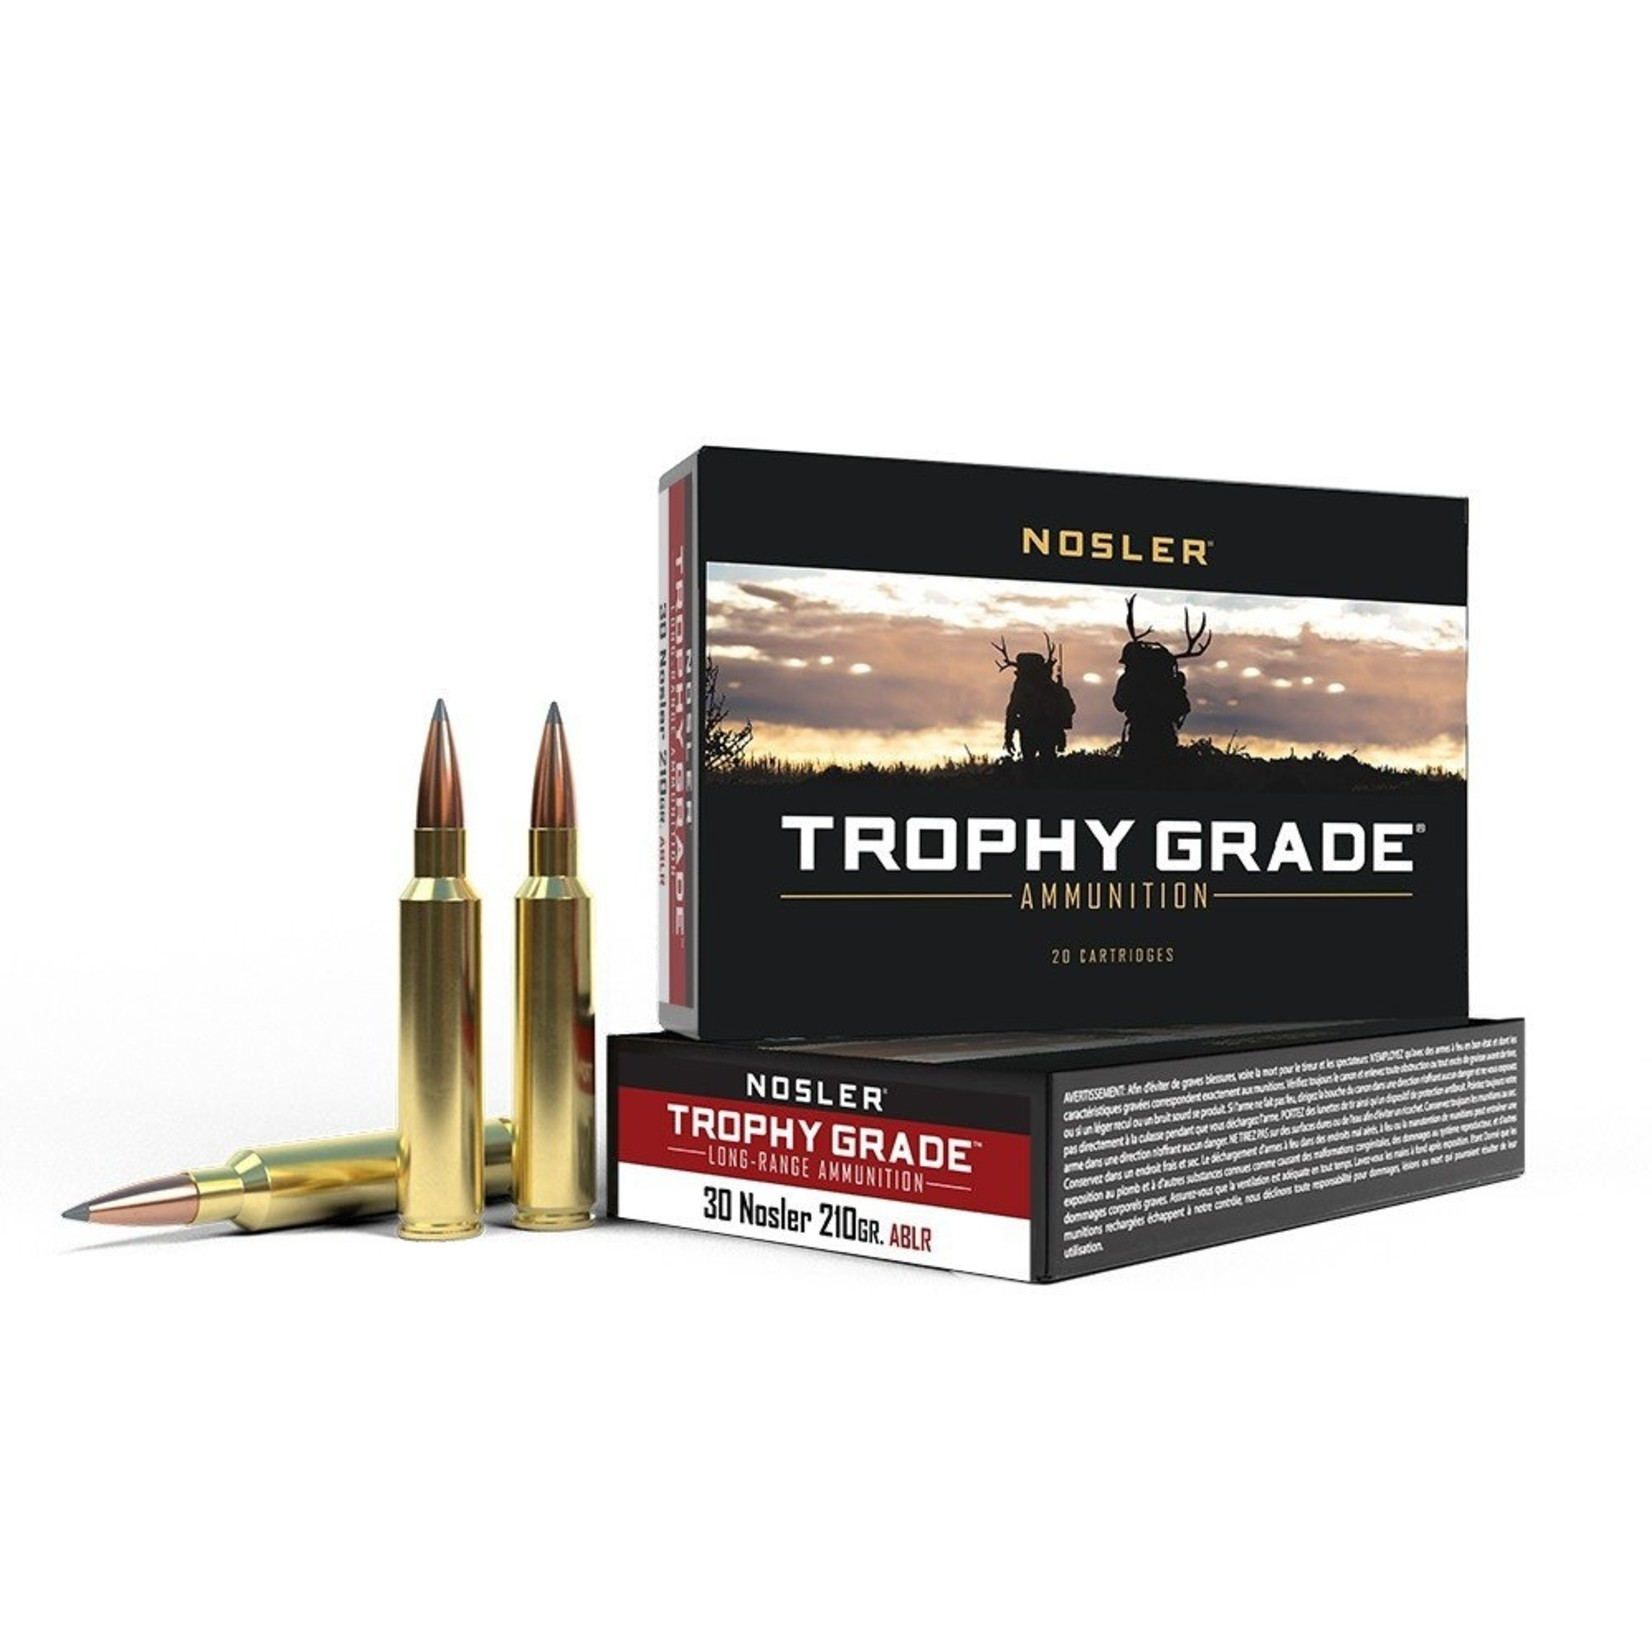 Nosler Trophy Grade Ammunition (20 Rounds)